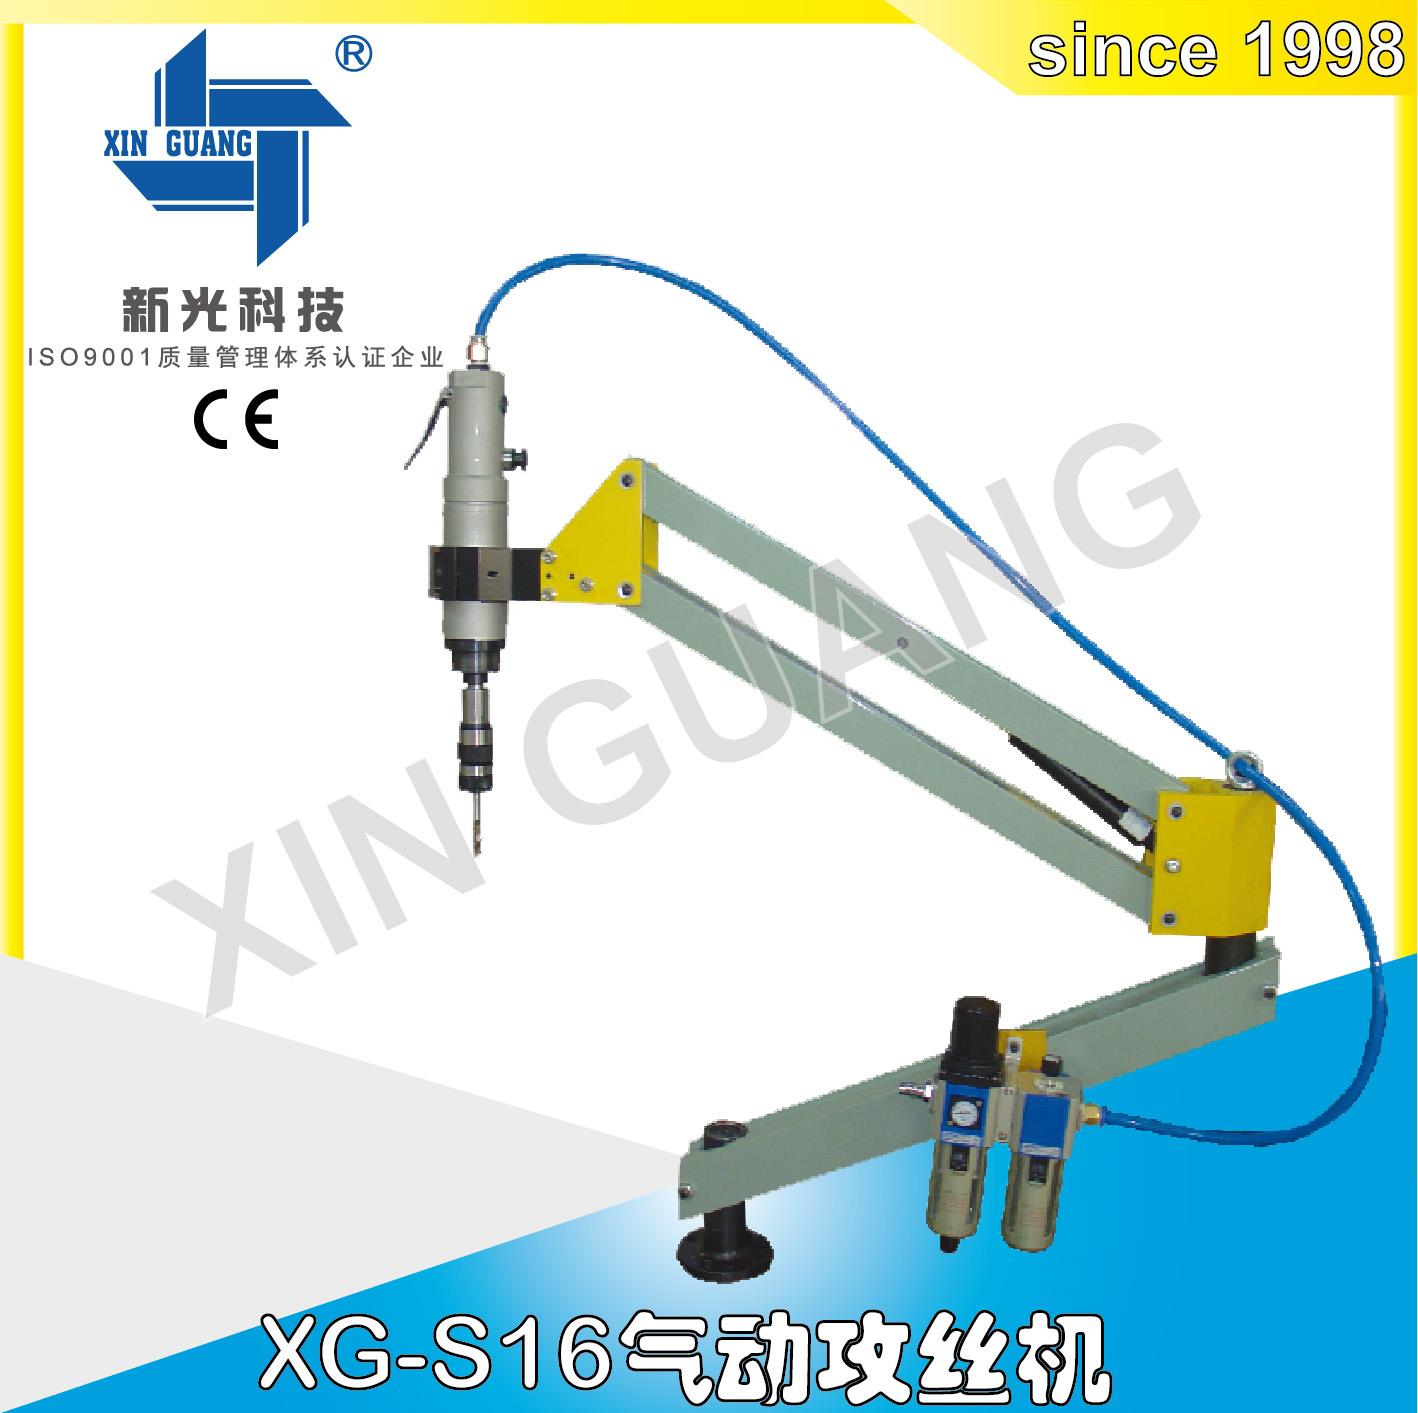 XG-S16型(M3-M16)气动攻丝机 台湾原装气动马达 品质保证